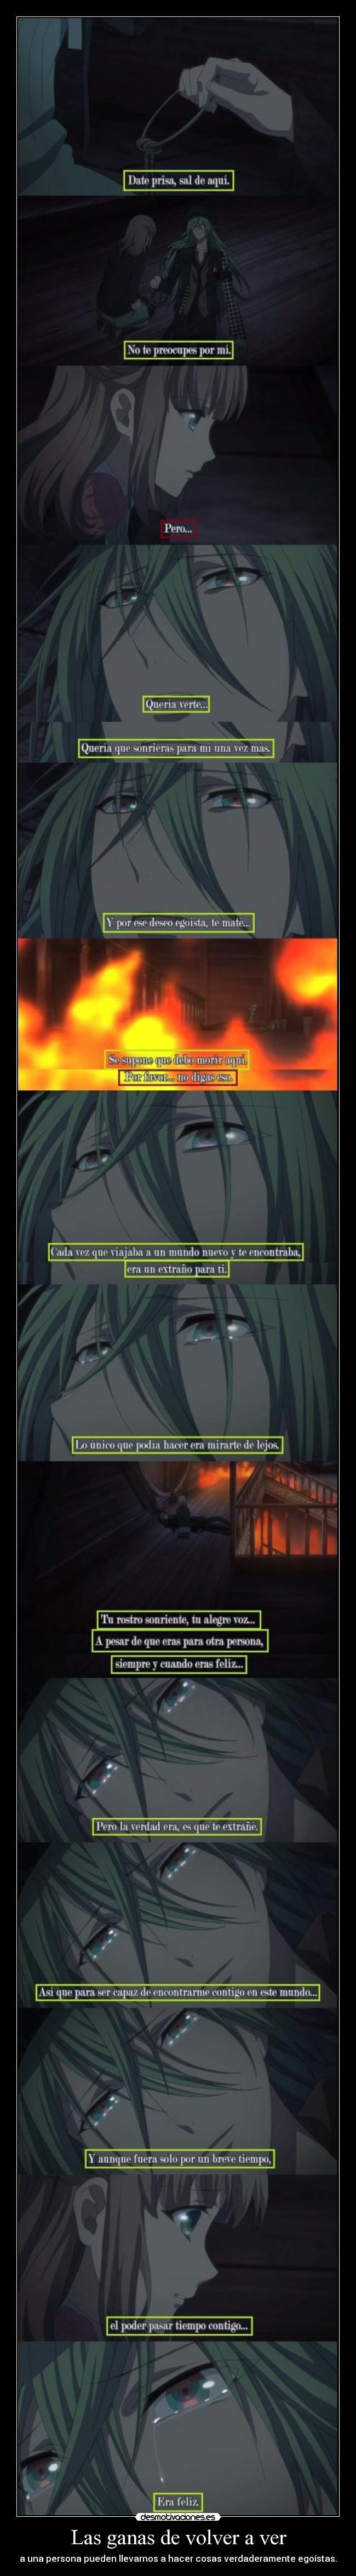 carteles raptorhunters nigatsu harukaze anime manga otaku amnesia amor dolor love muerte matar egoista desmotivaciones